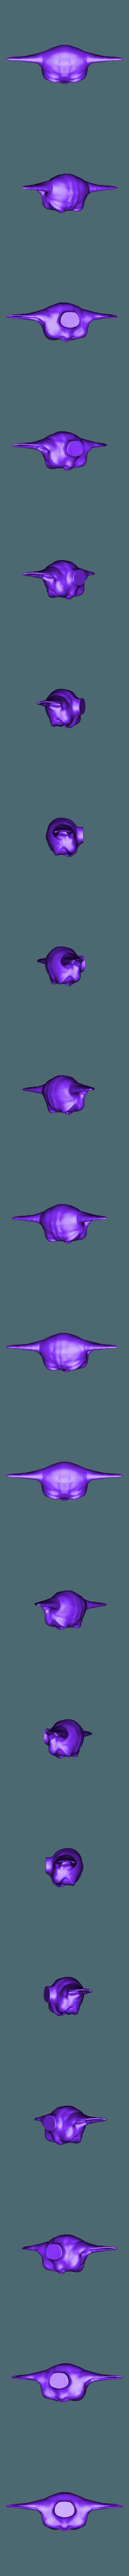 cabeza.OBJ Download free OBJ file Baby yoda cup • 3D printable model, Alquimia3D